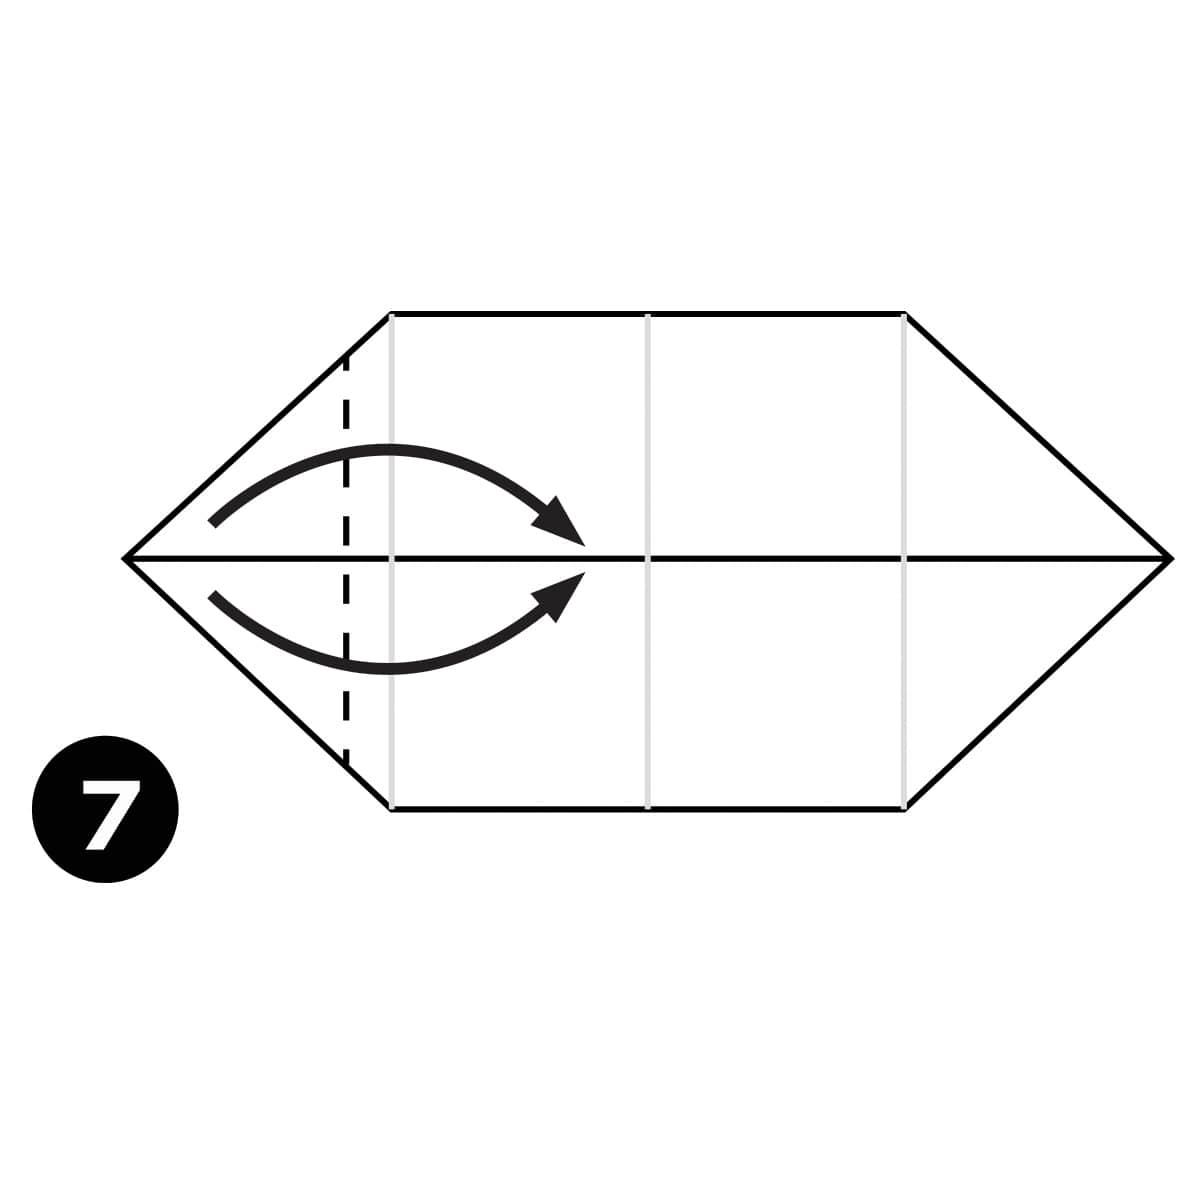 Goat Step 7